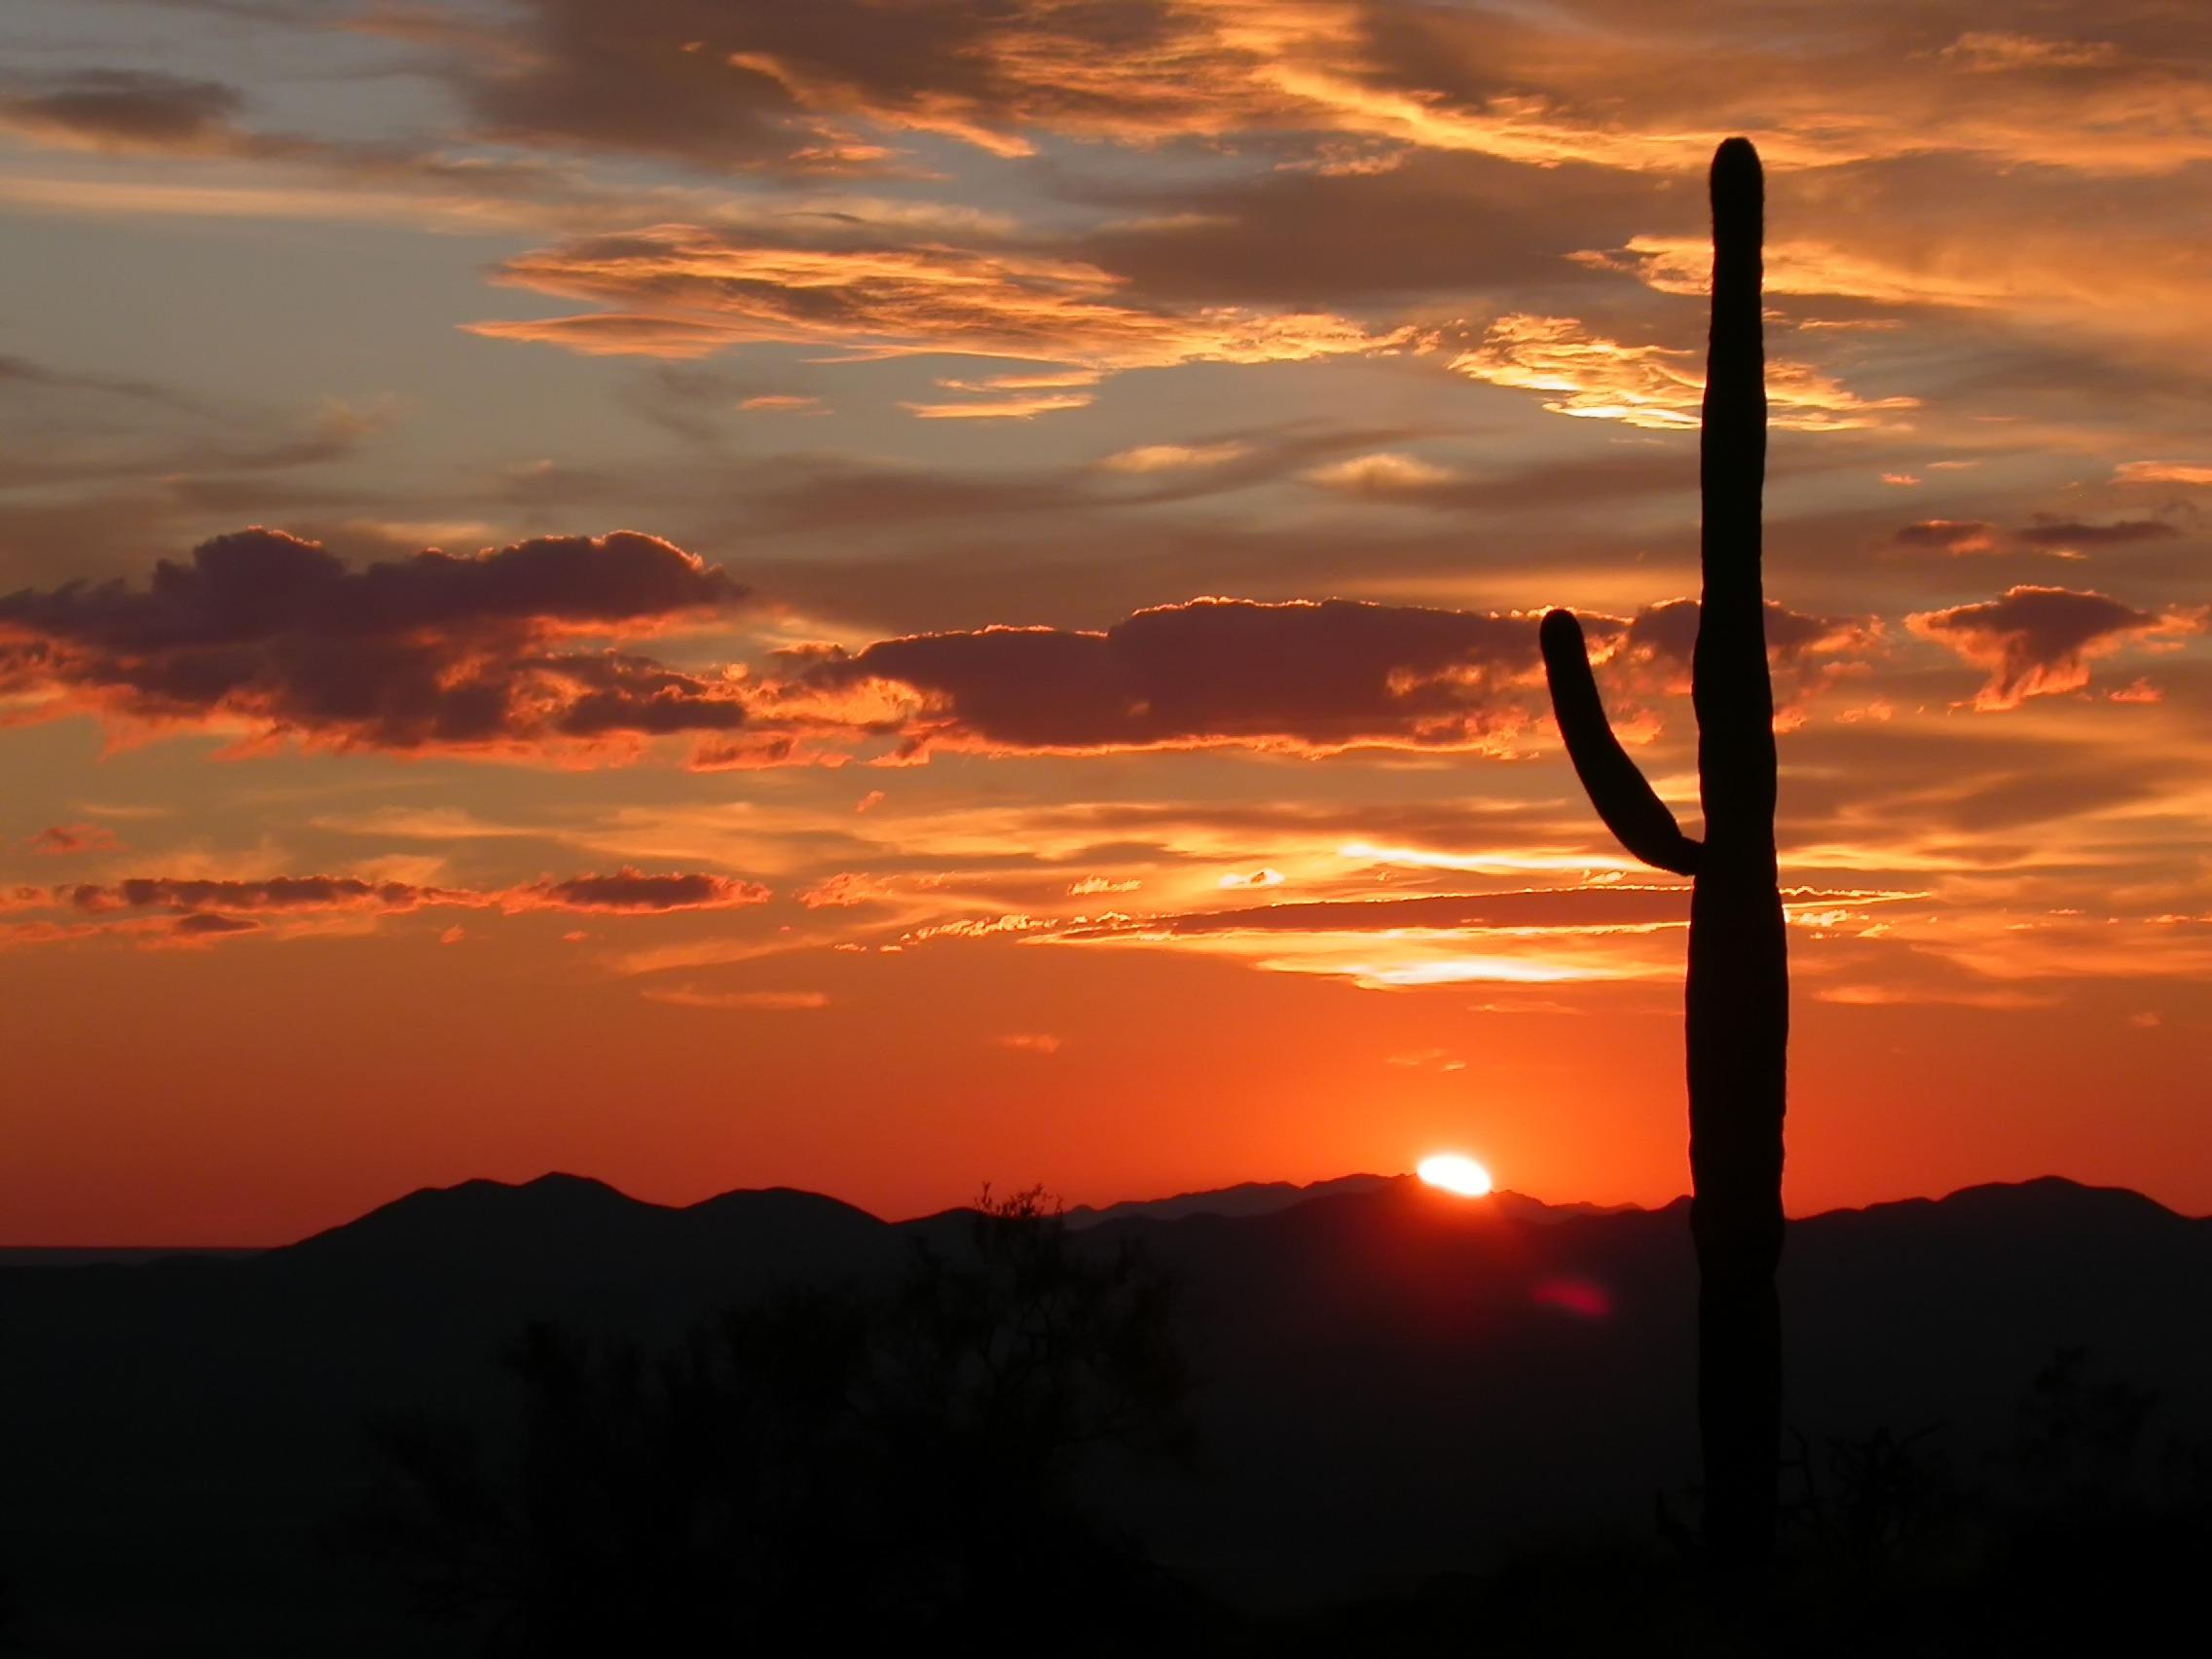 Sunset in arizona photo